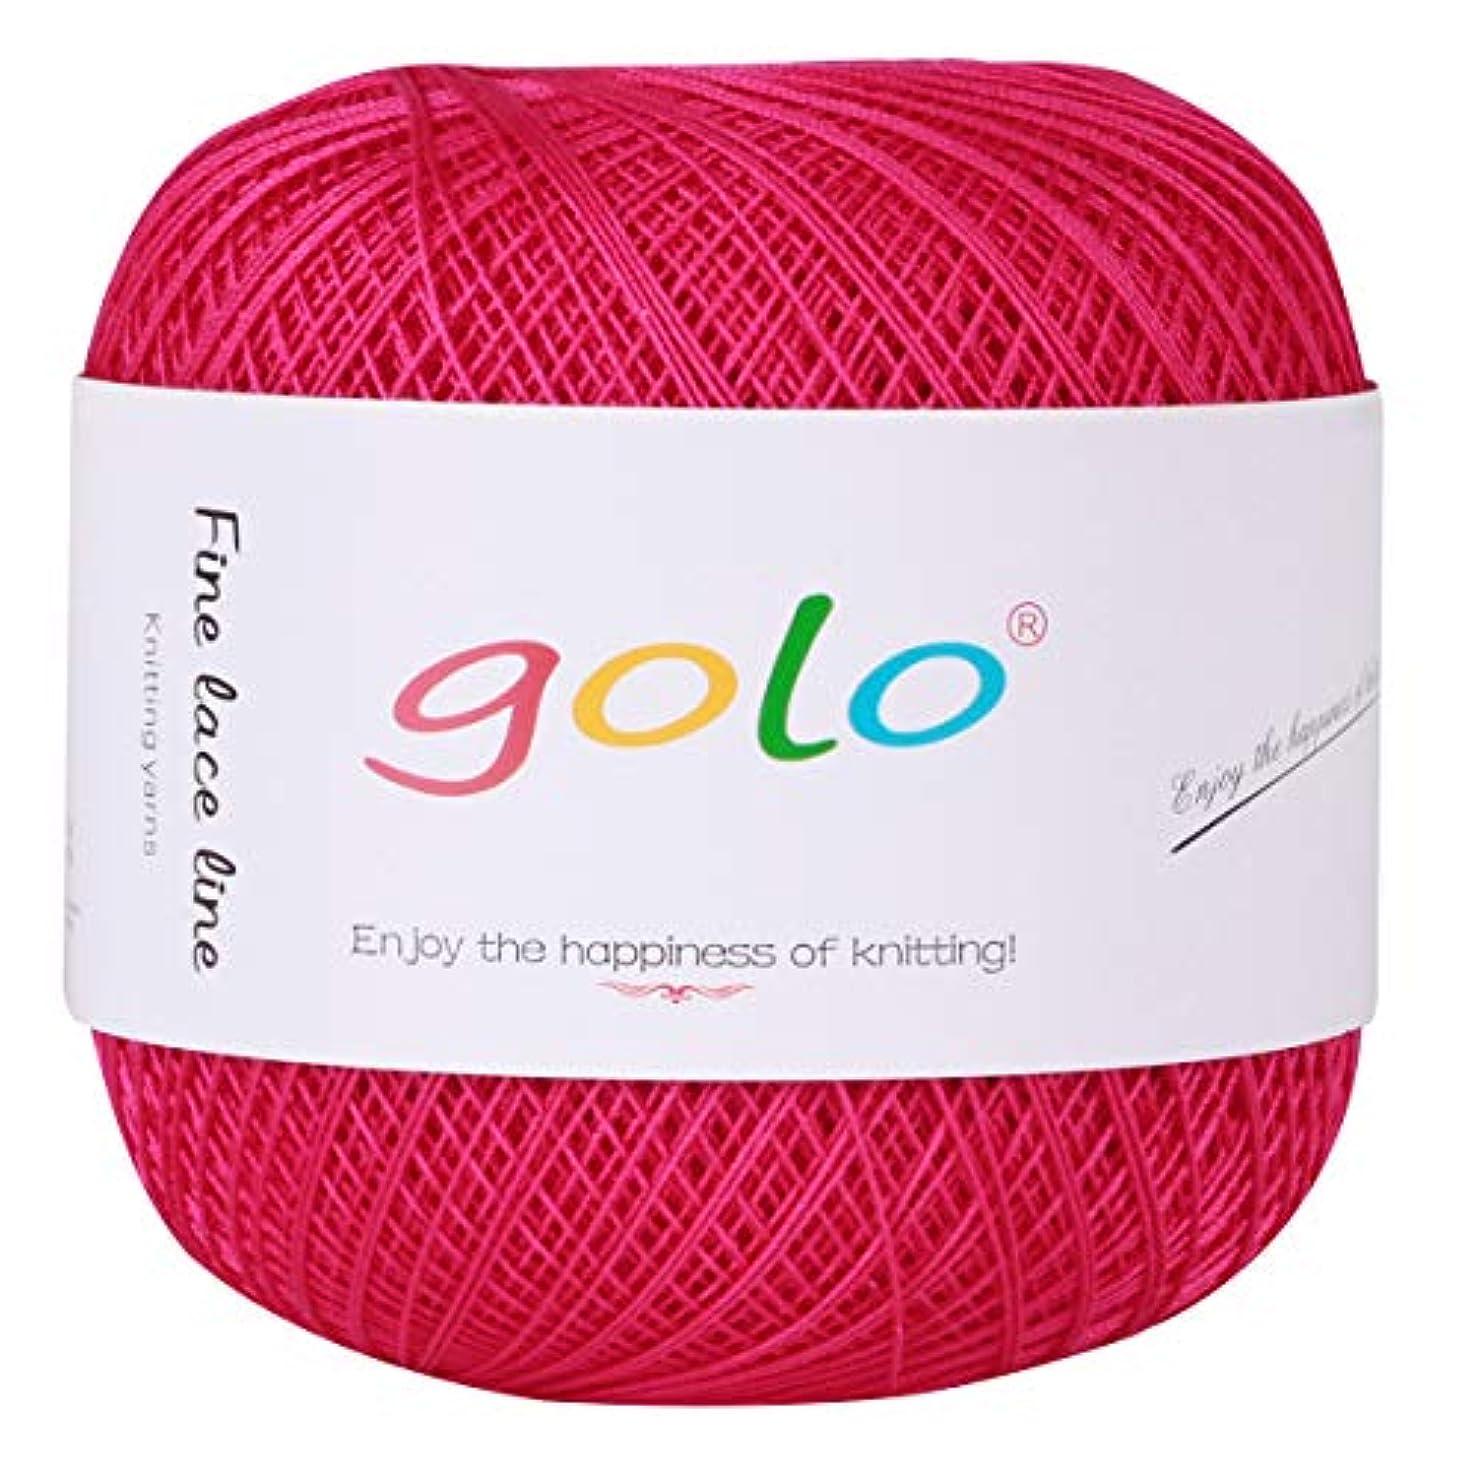 Crochet Thread Yarns for Begingers Size8-100% Contton Yarn for Knitting Crochet DIY Hardanger Cross Sitch Crochet Thread Balls Rainbow Turquoise 31 Colors Avilable (Watermelon red)